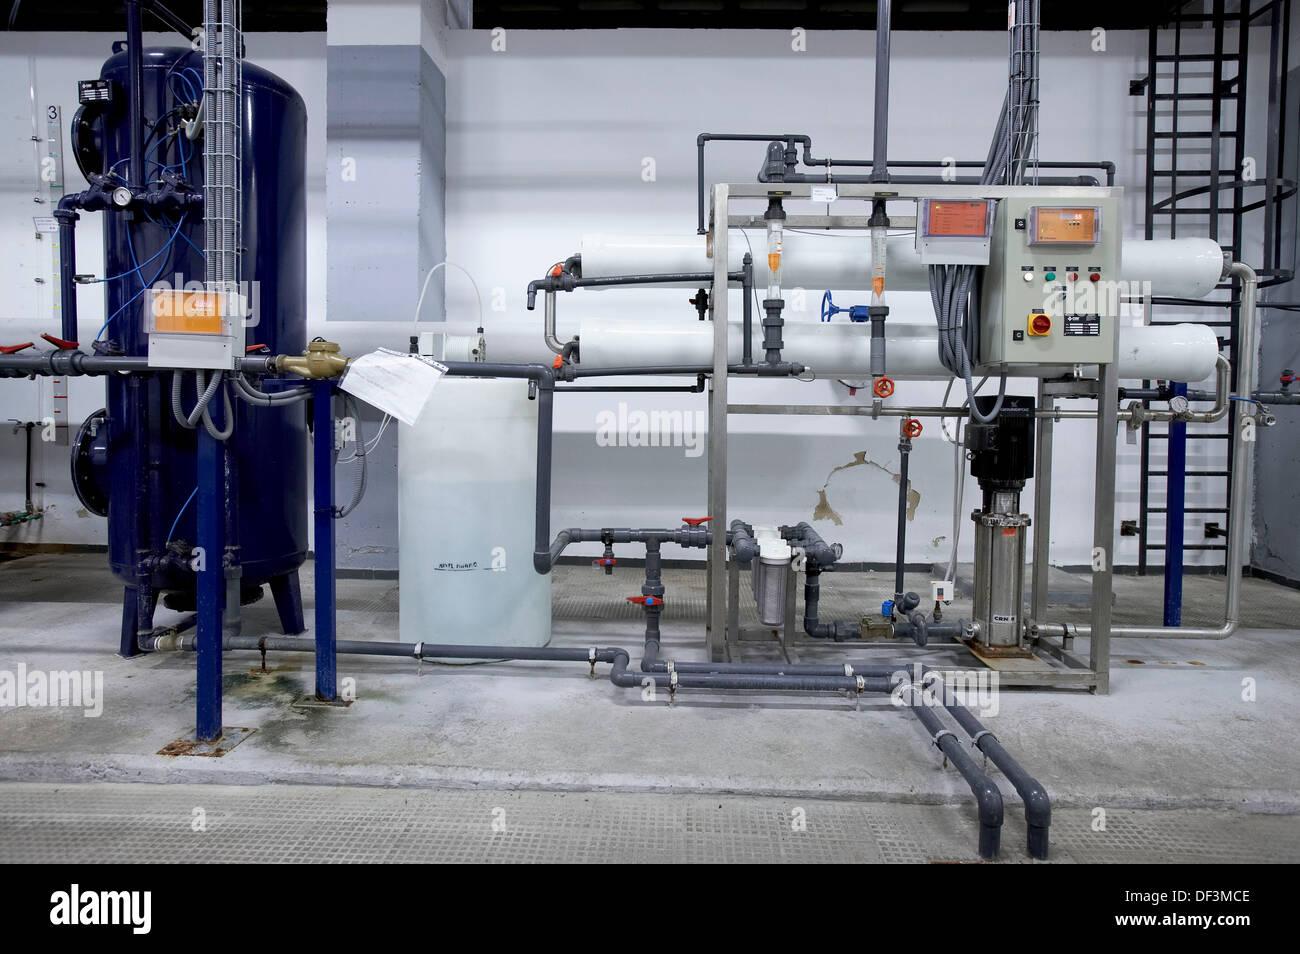 Reverse osmosis facility to purificate water. Hospital Universitario Gran Canaria Doctor Negrin, Las Palmas de Gran Canaria. - Stock Image